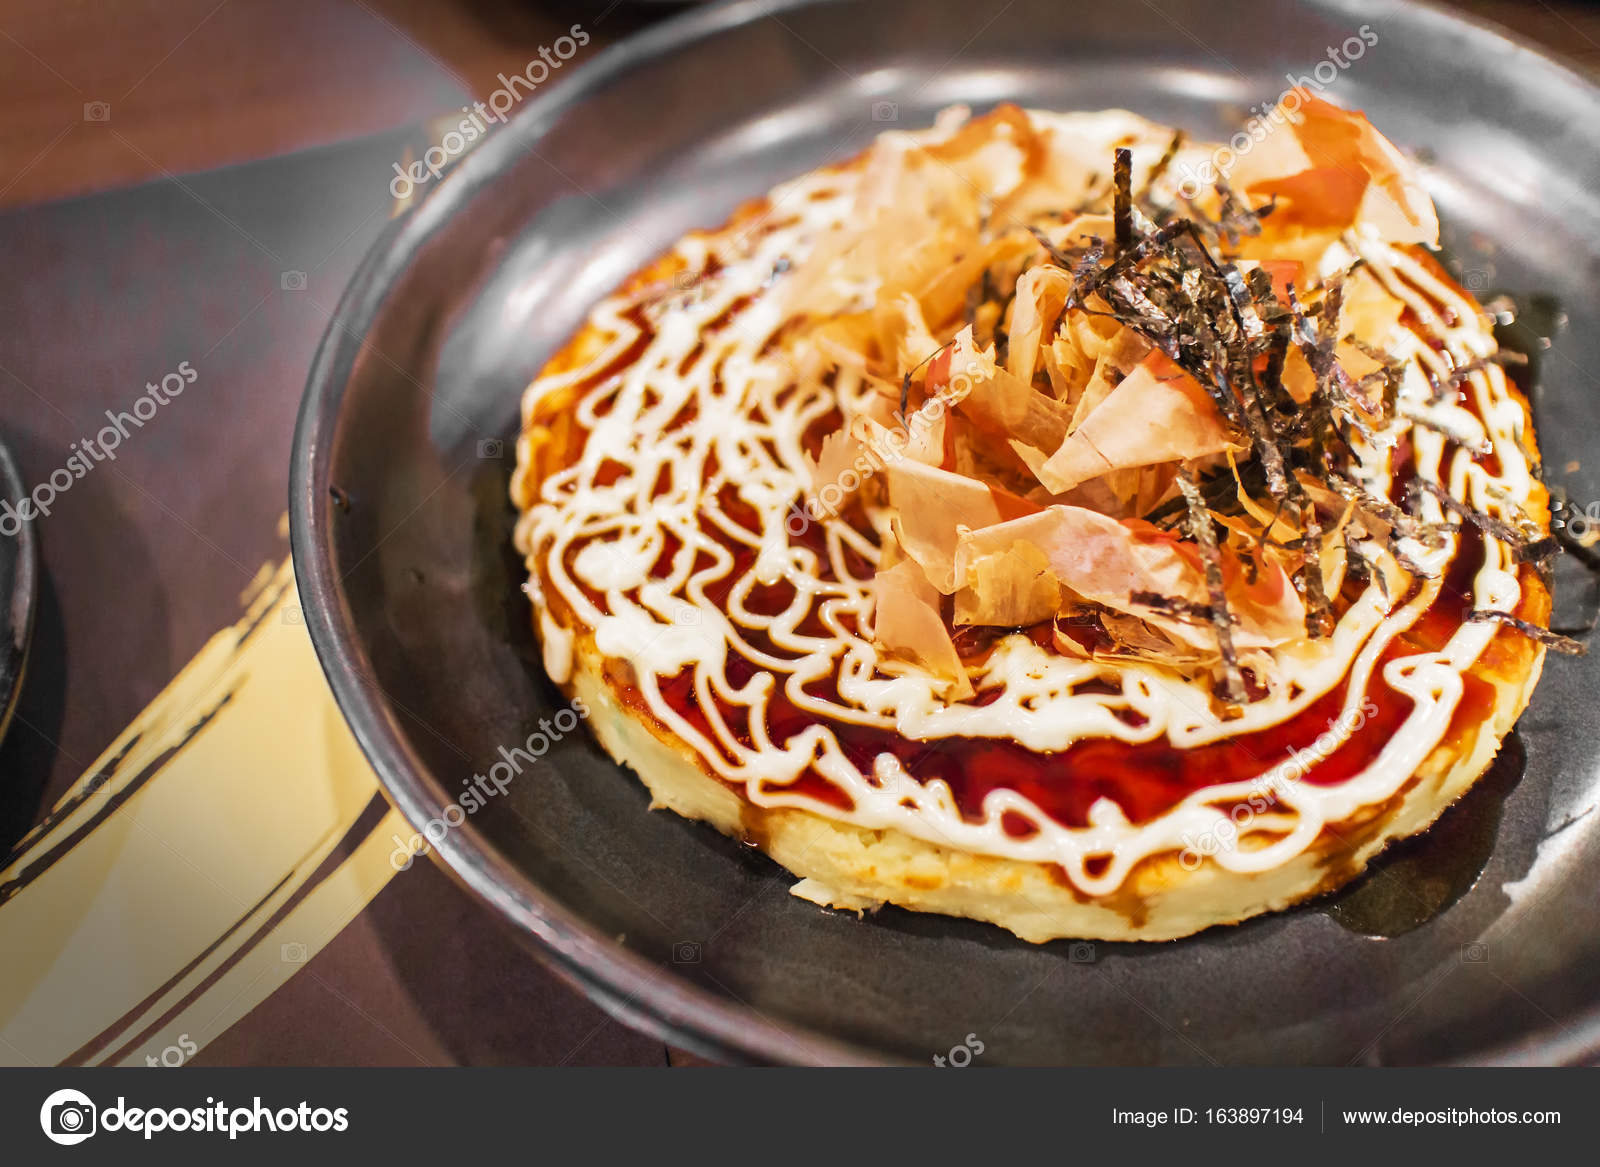 Okonomiyaki recipe japanese style pancakes or pizza popular okonomiyaki recipe japanese style pancakes or pizza popular japanese traditional food stock forumfinder Image collections